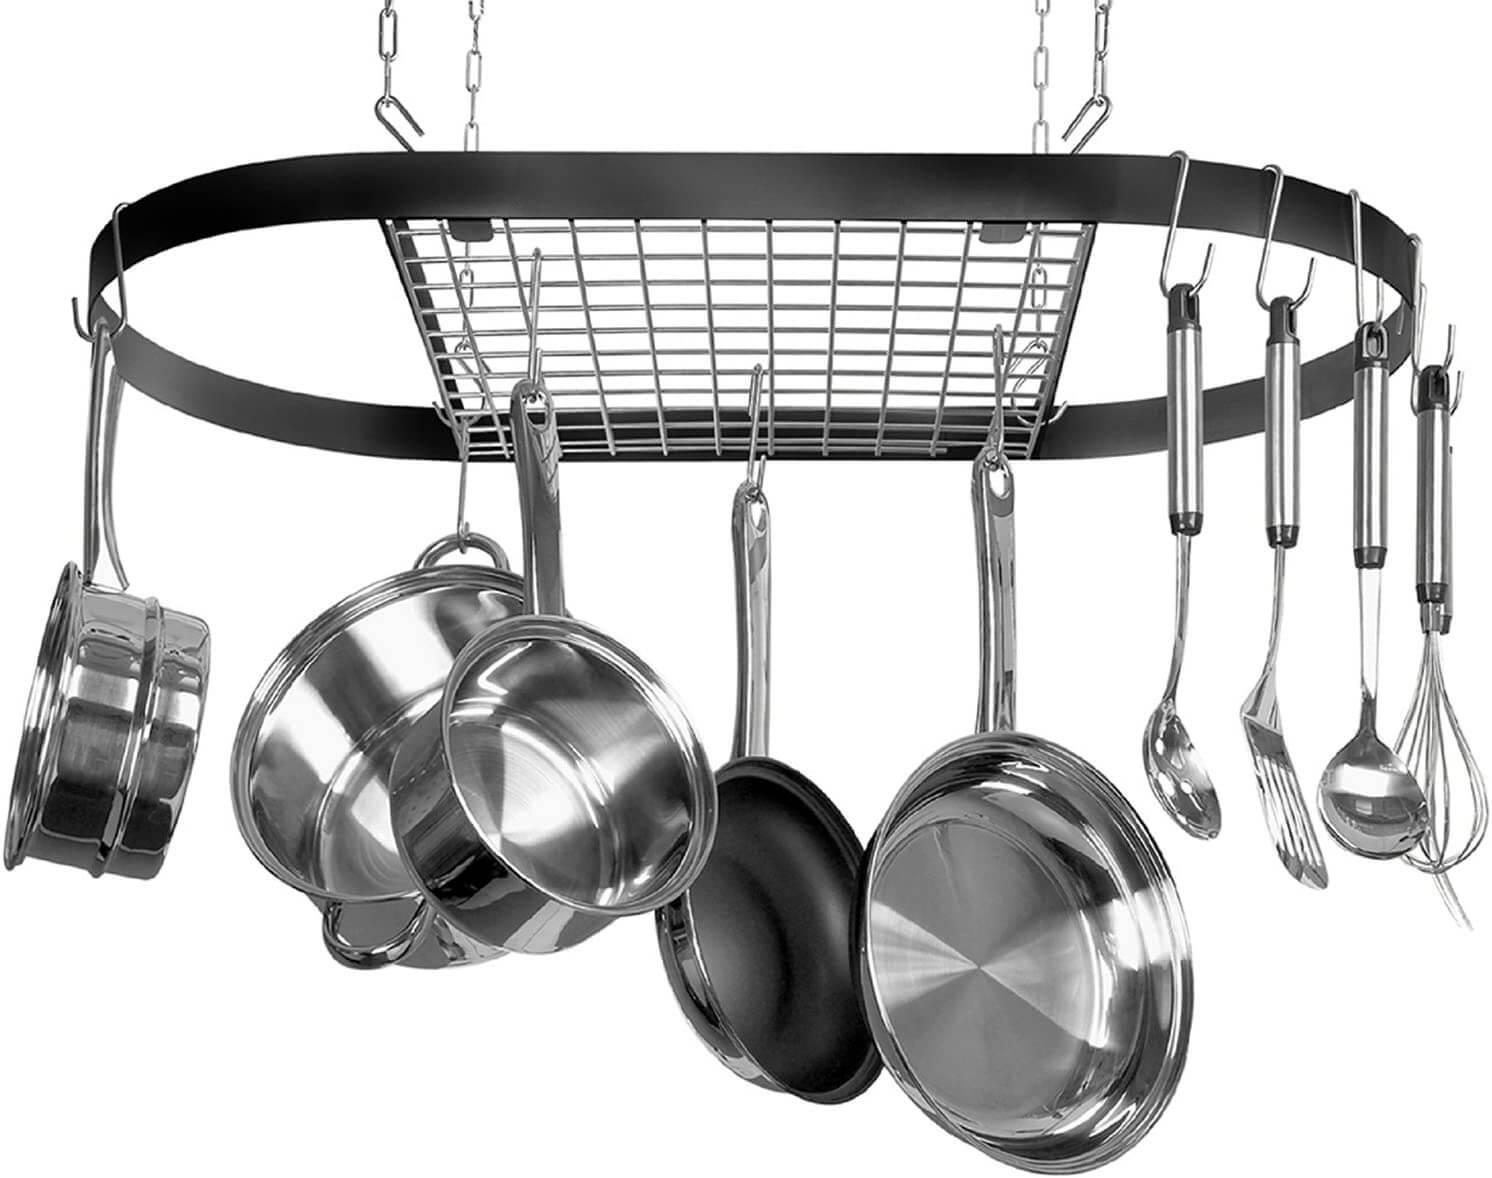 Kinetic Pot Rack, Black with Silver Rack